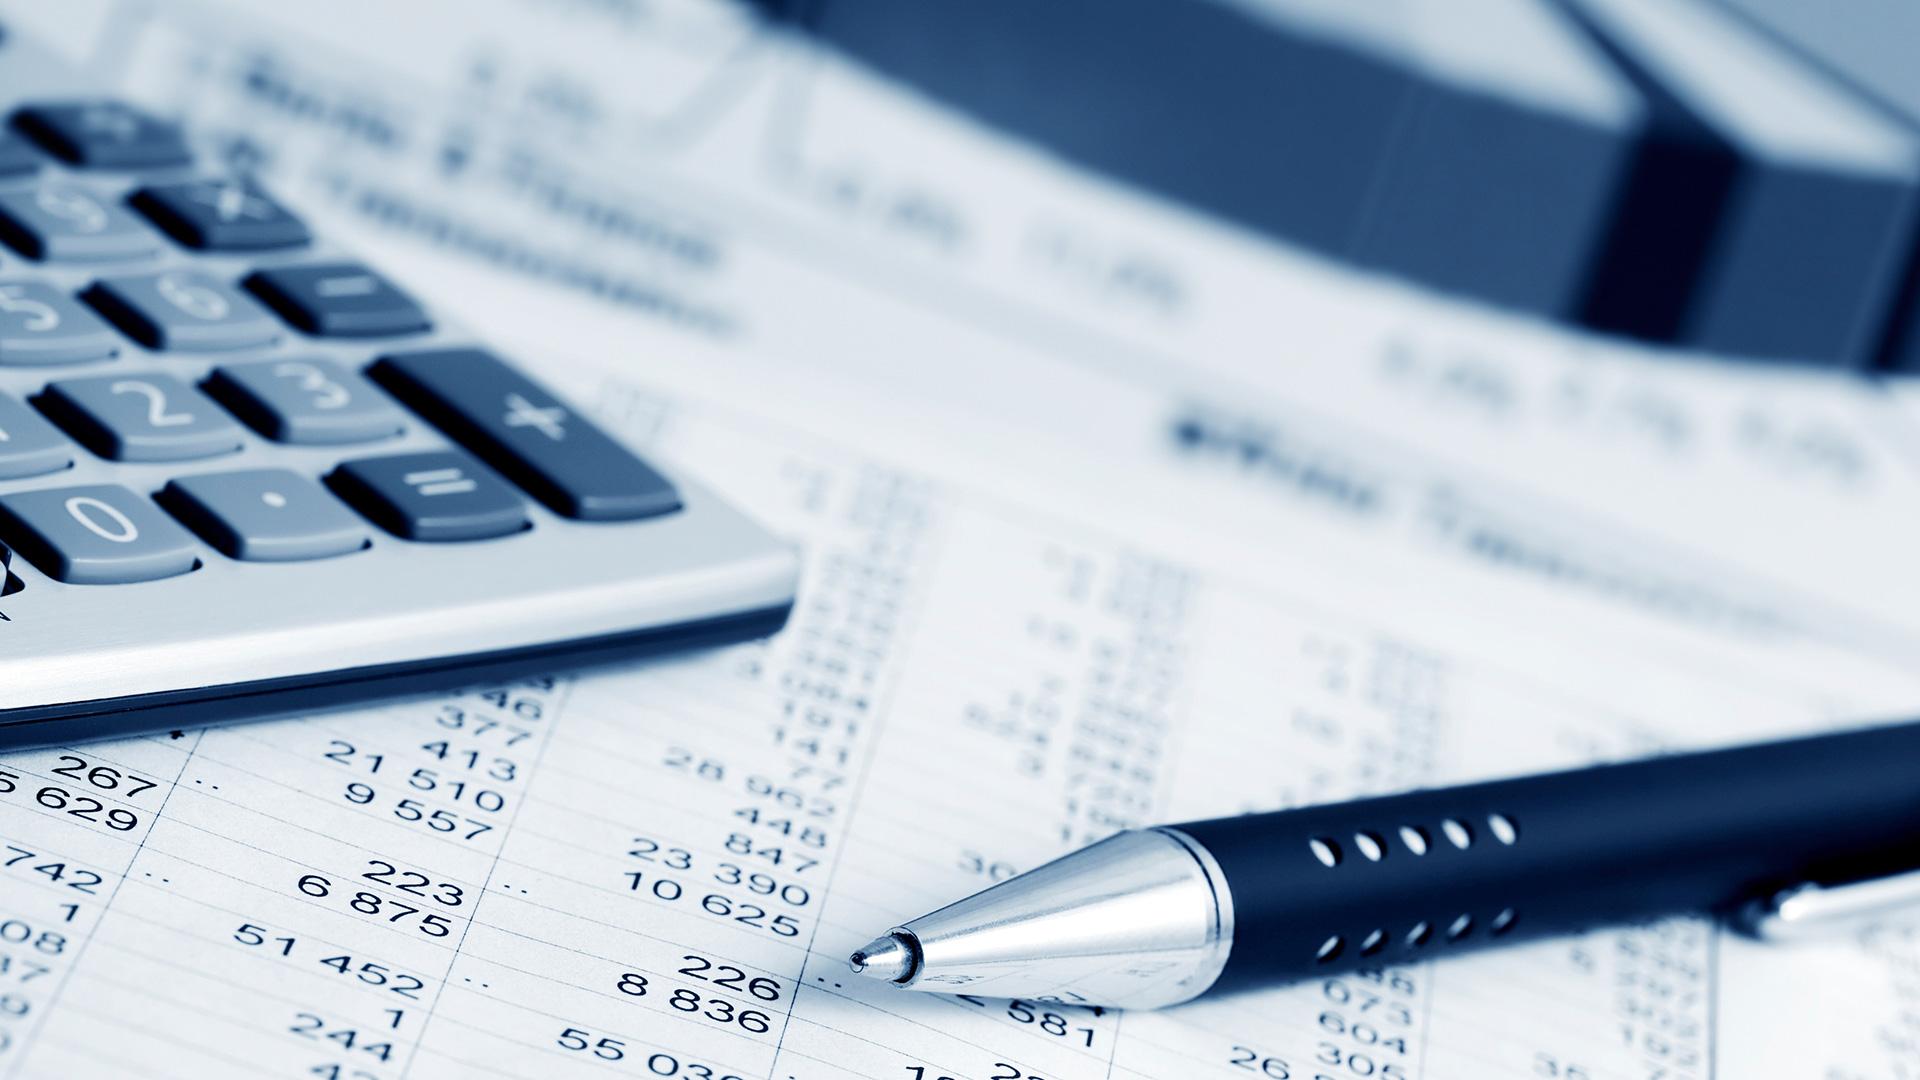 e-filing income tax returns in India